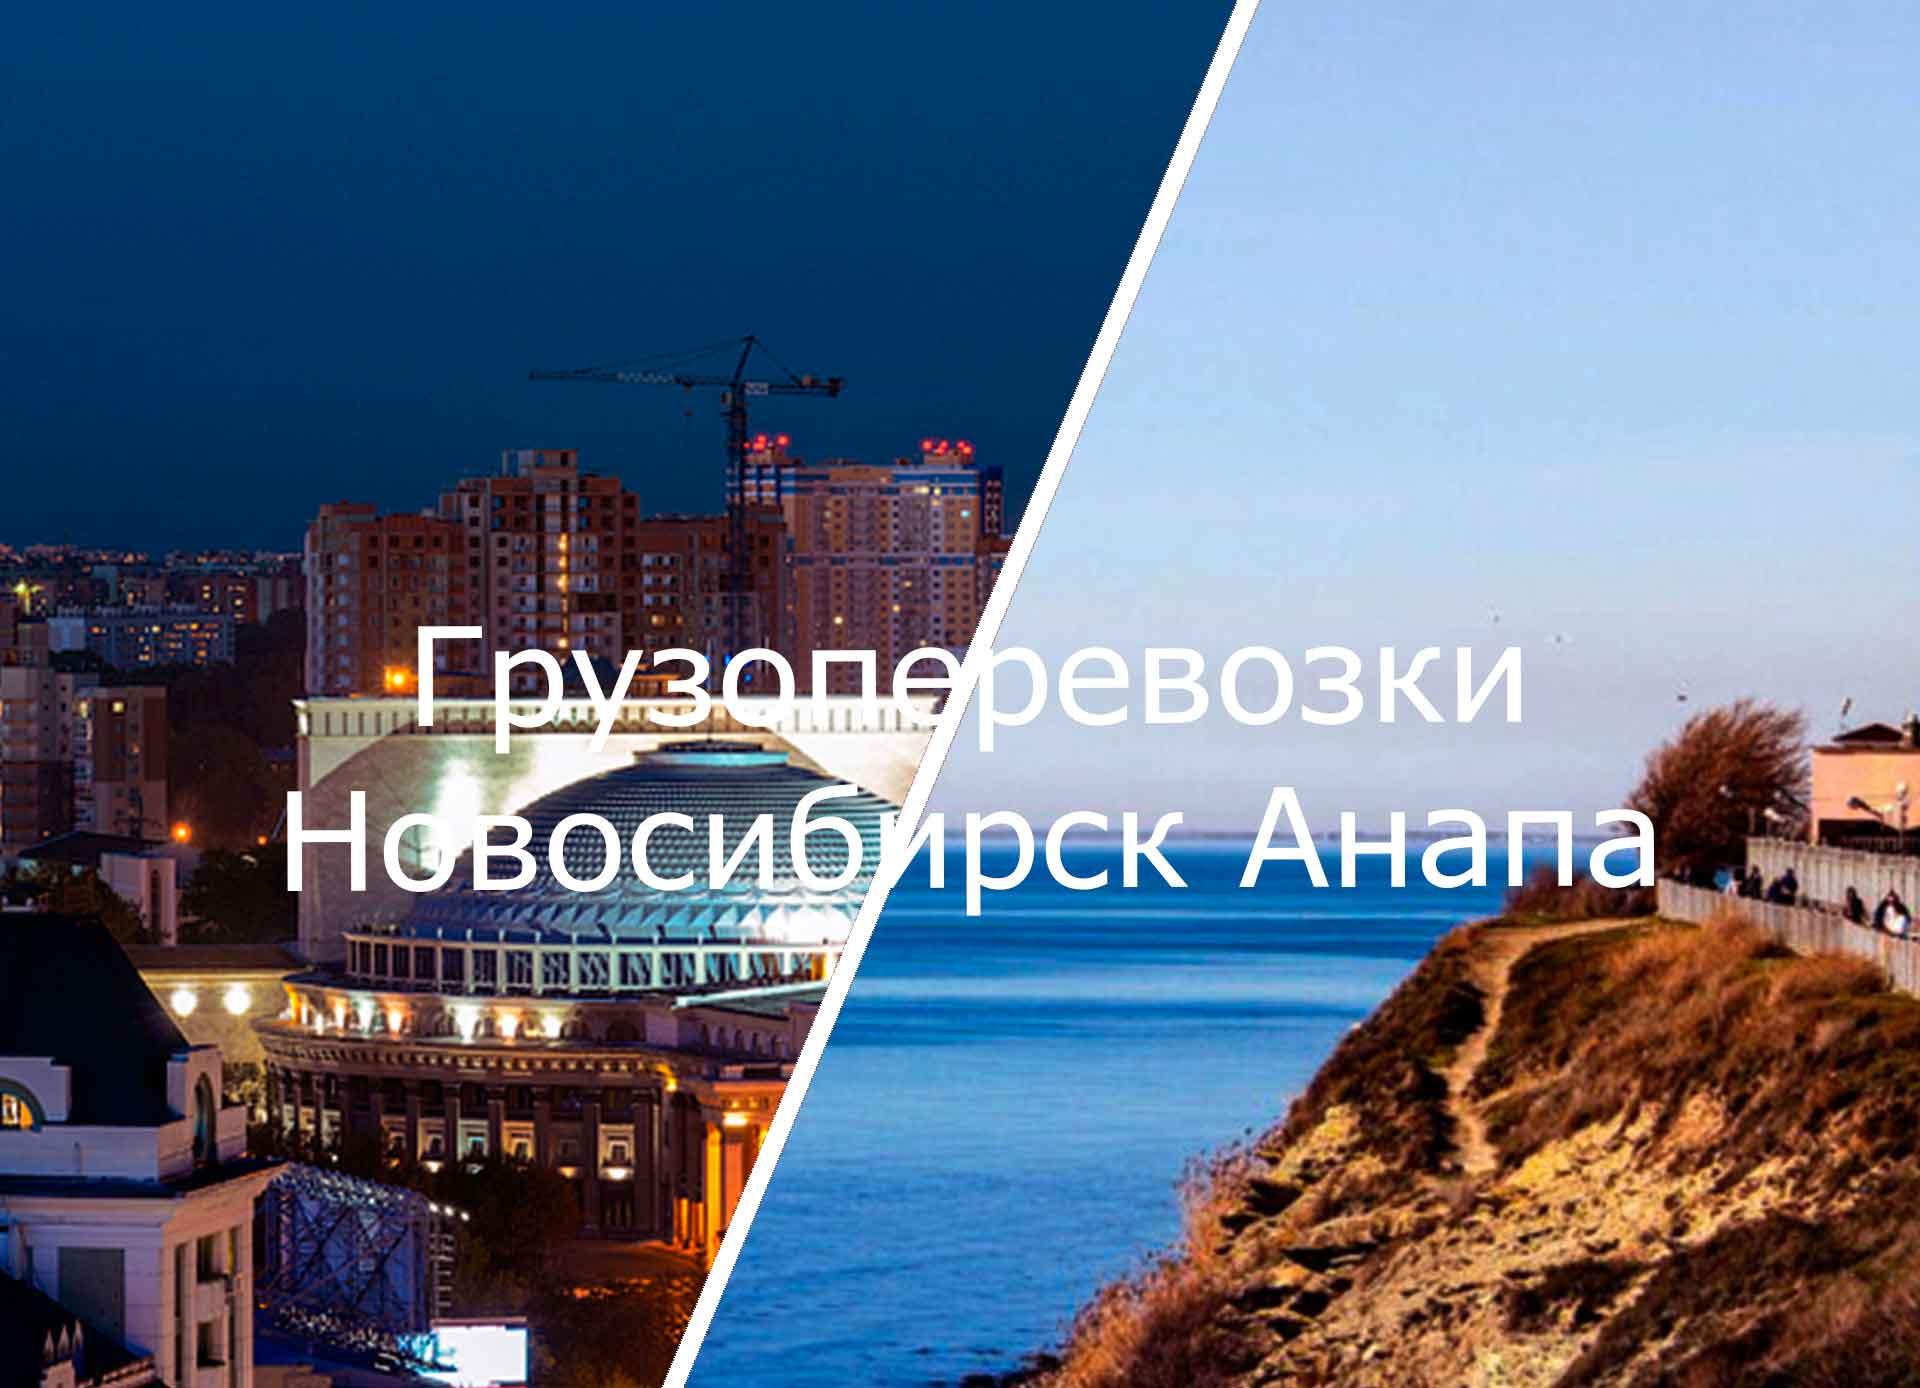 грузоперевозки новосибирск анапа